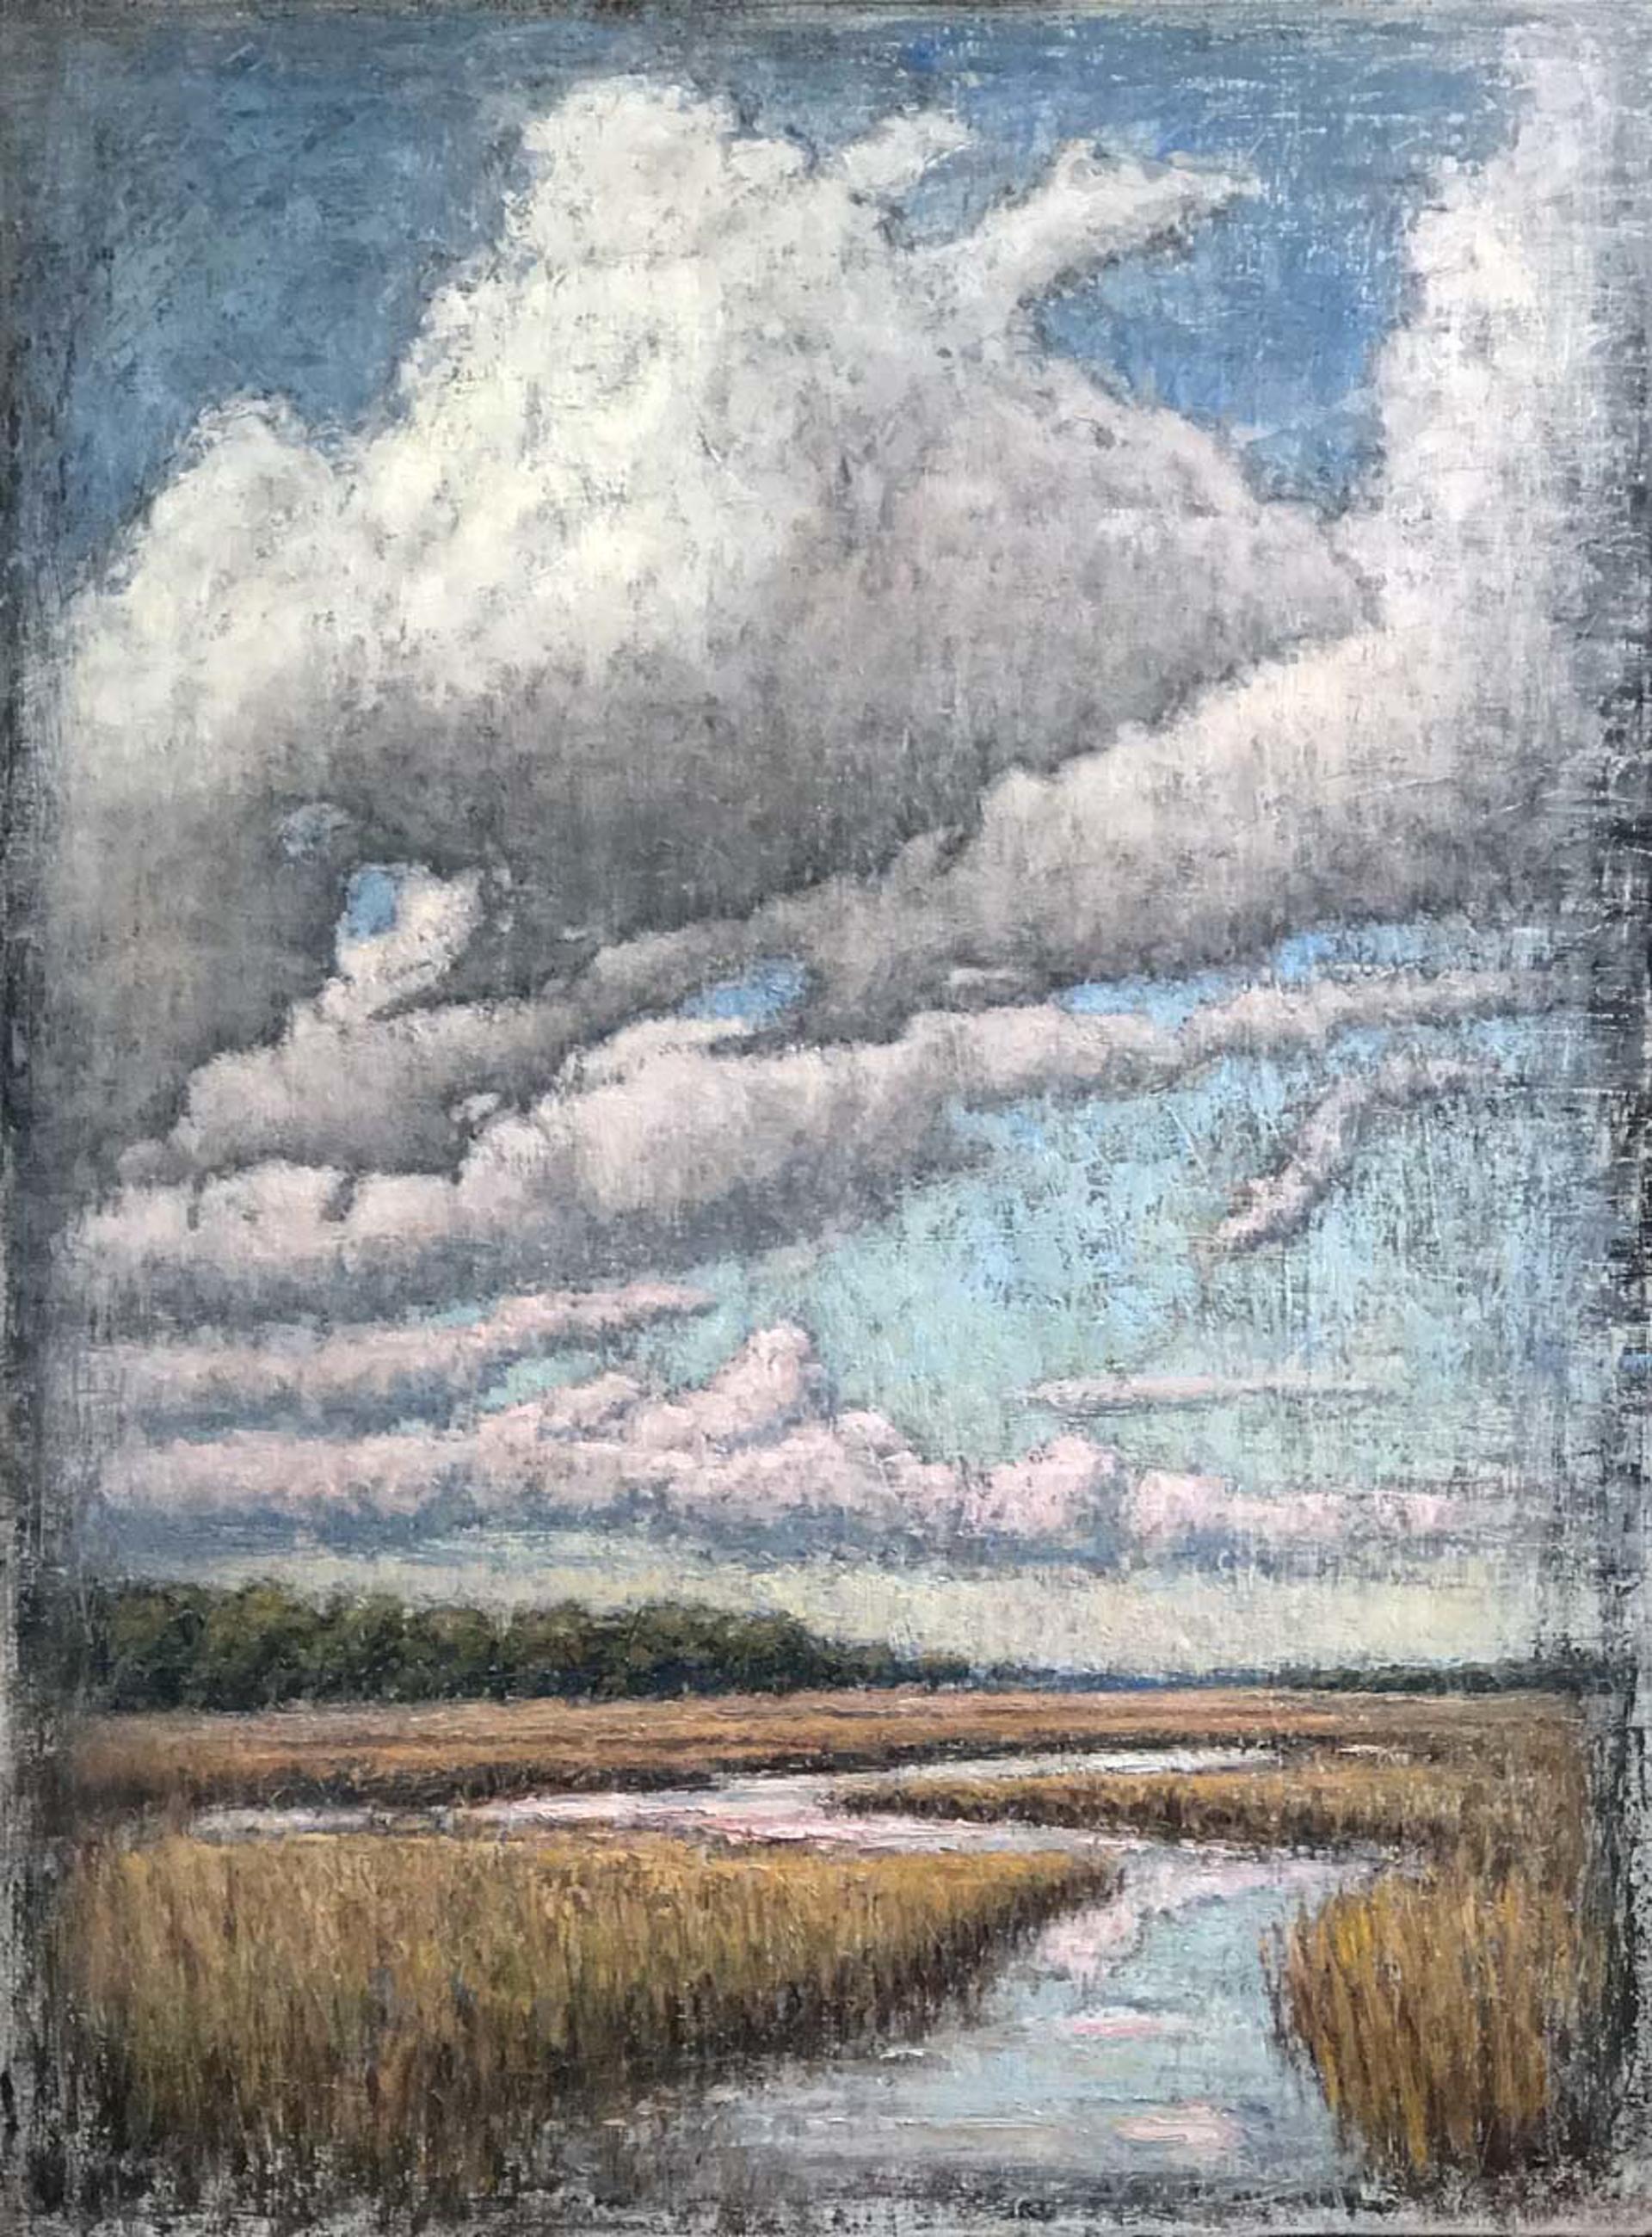 Kiawah Passage by Brett Weaver